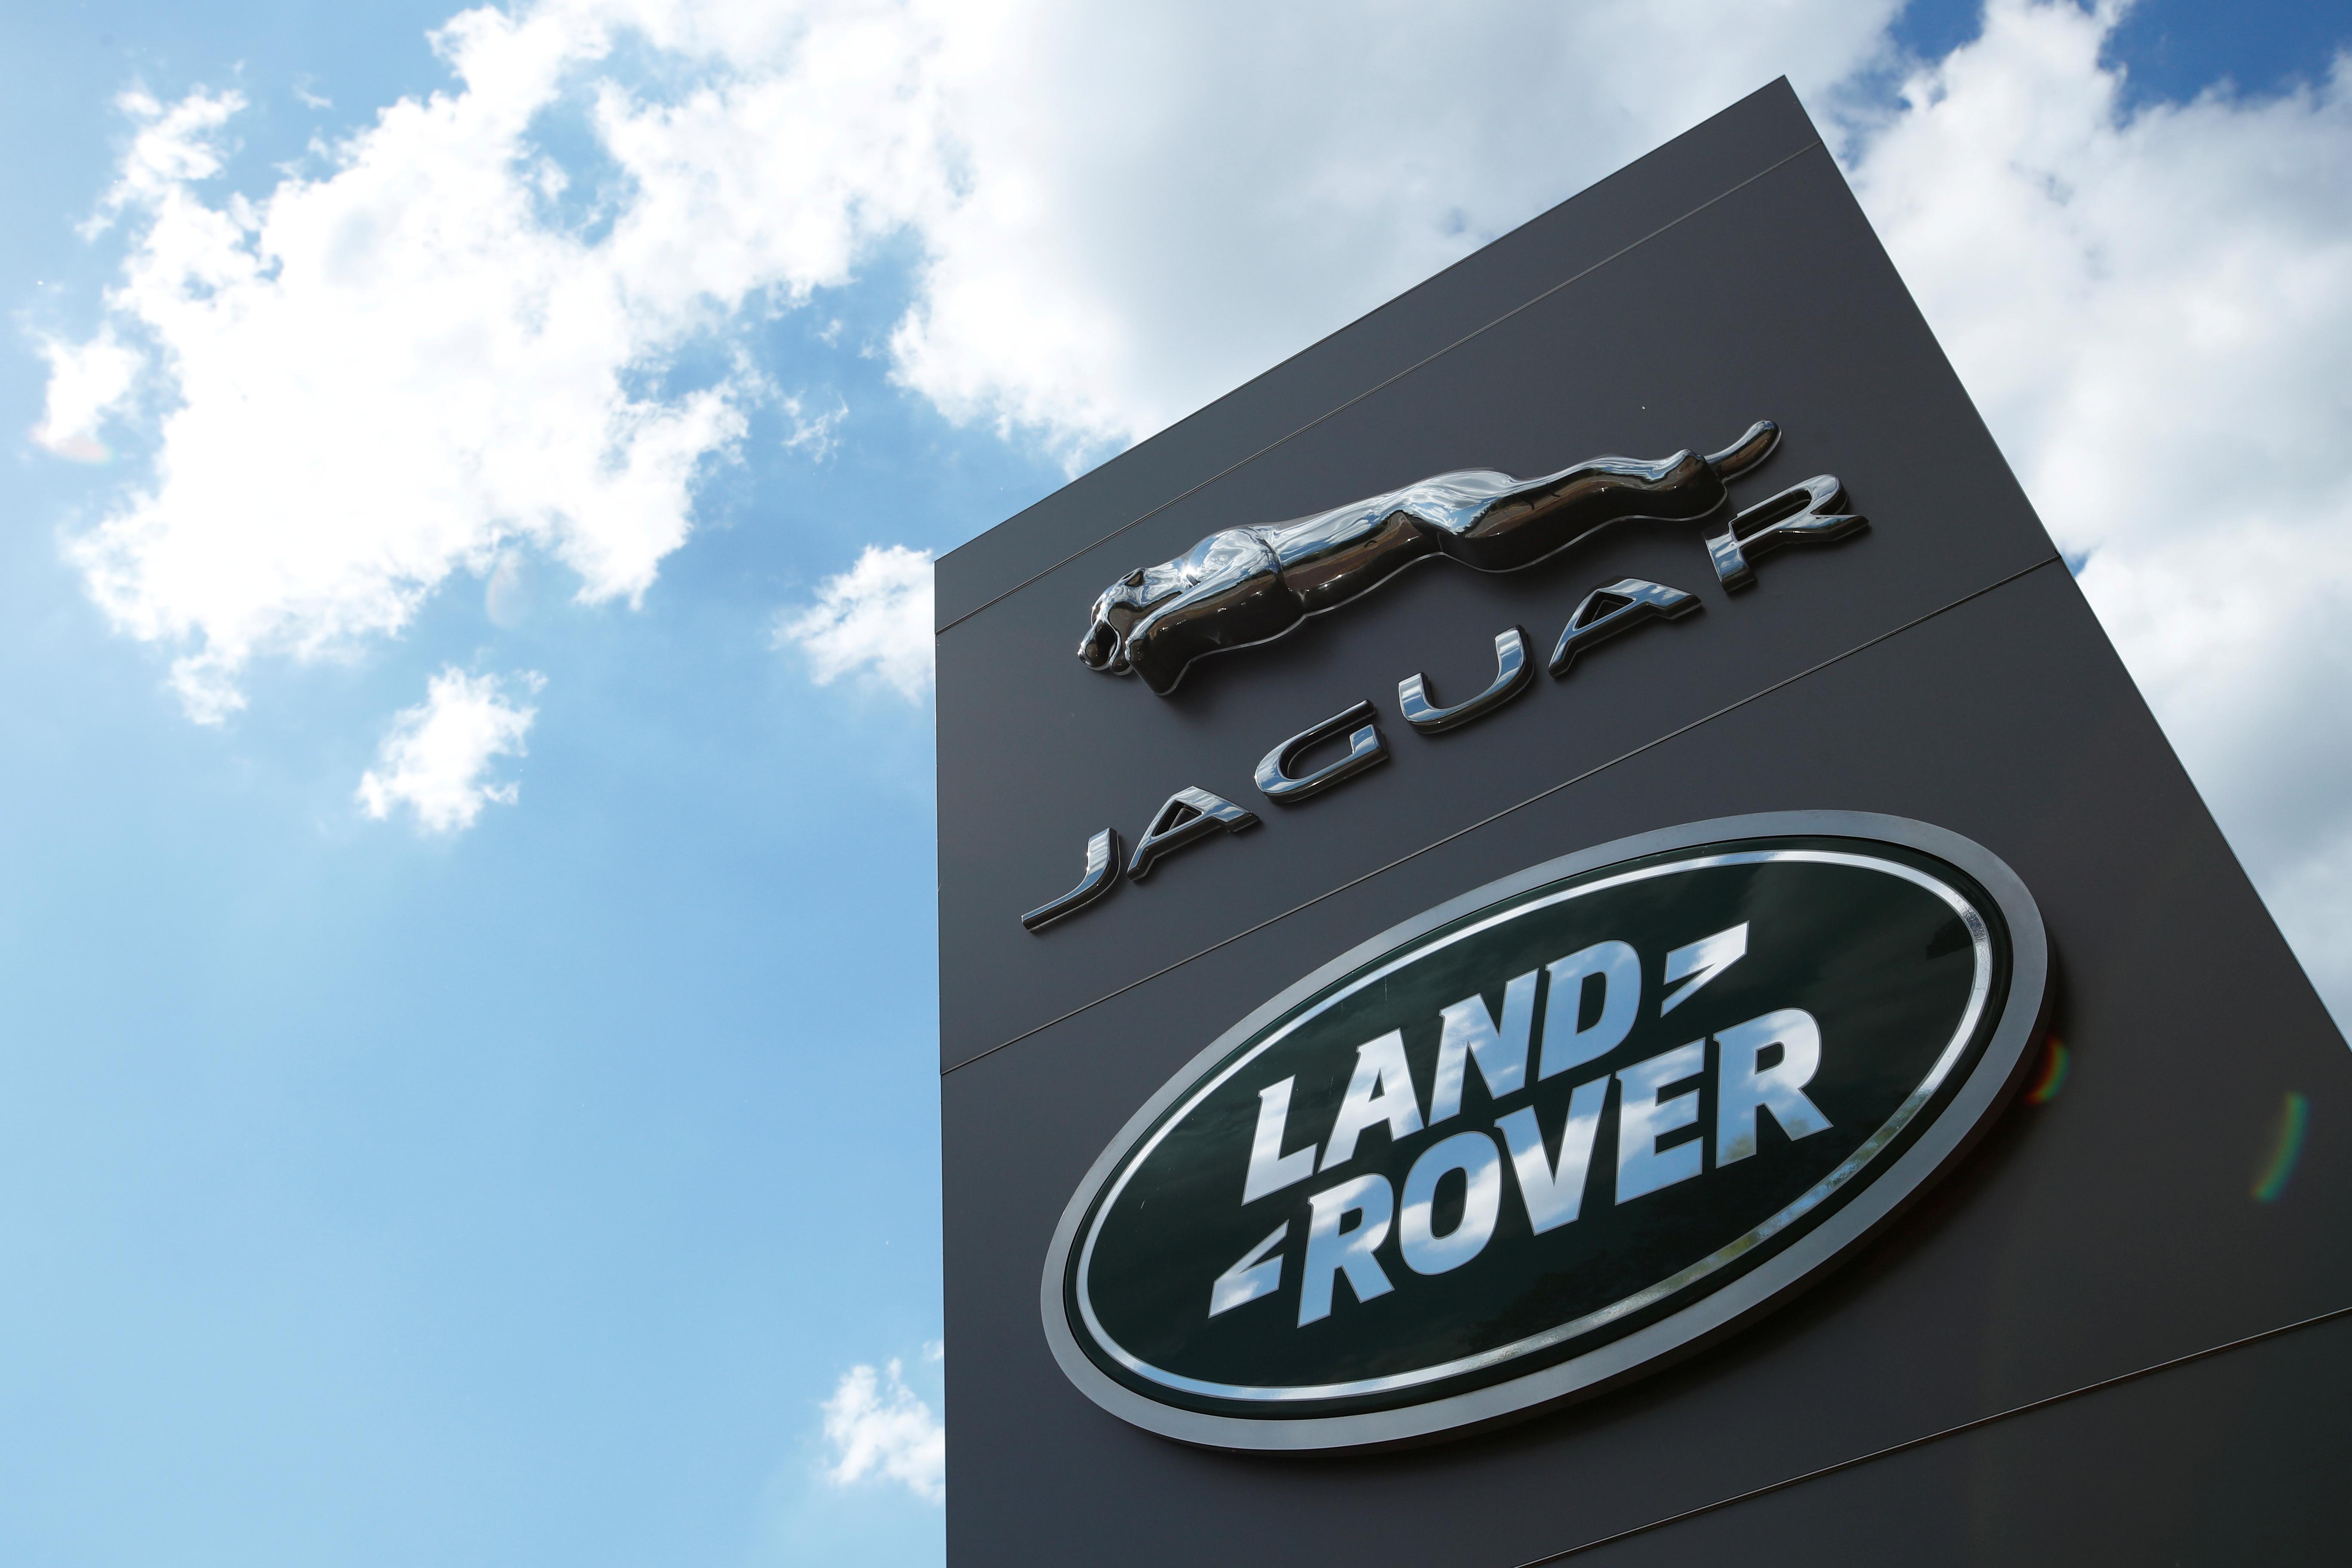 The Jaguar Land Rover logo is seen at a dealership, following the outbreak of the coronavirus disease (COVID-19), Milton Keynes, Britain, June 1, 2020. REUTERS/Andrew Boyers